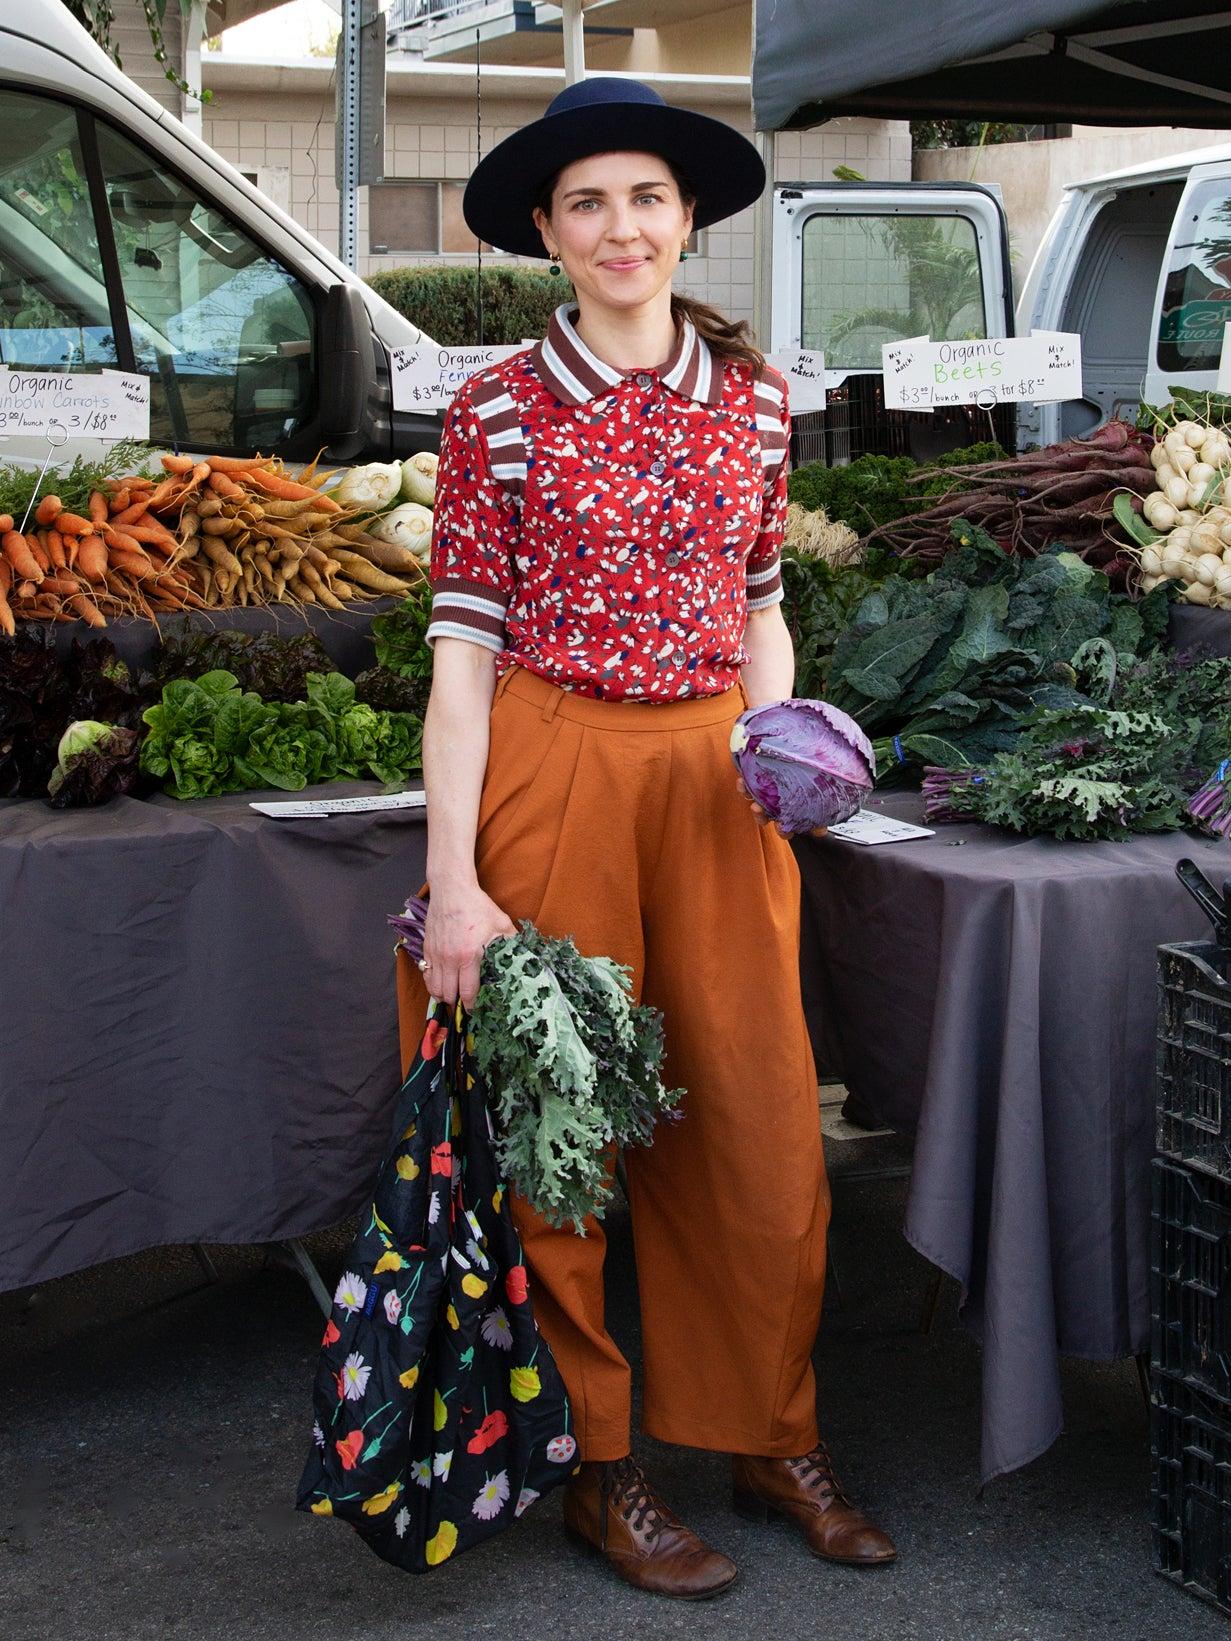 Julia Sherman at the farmers market